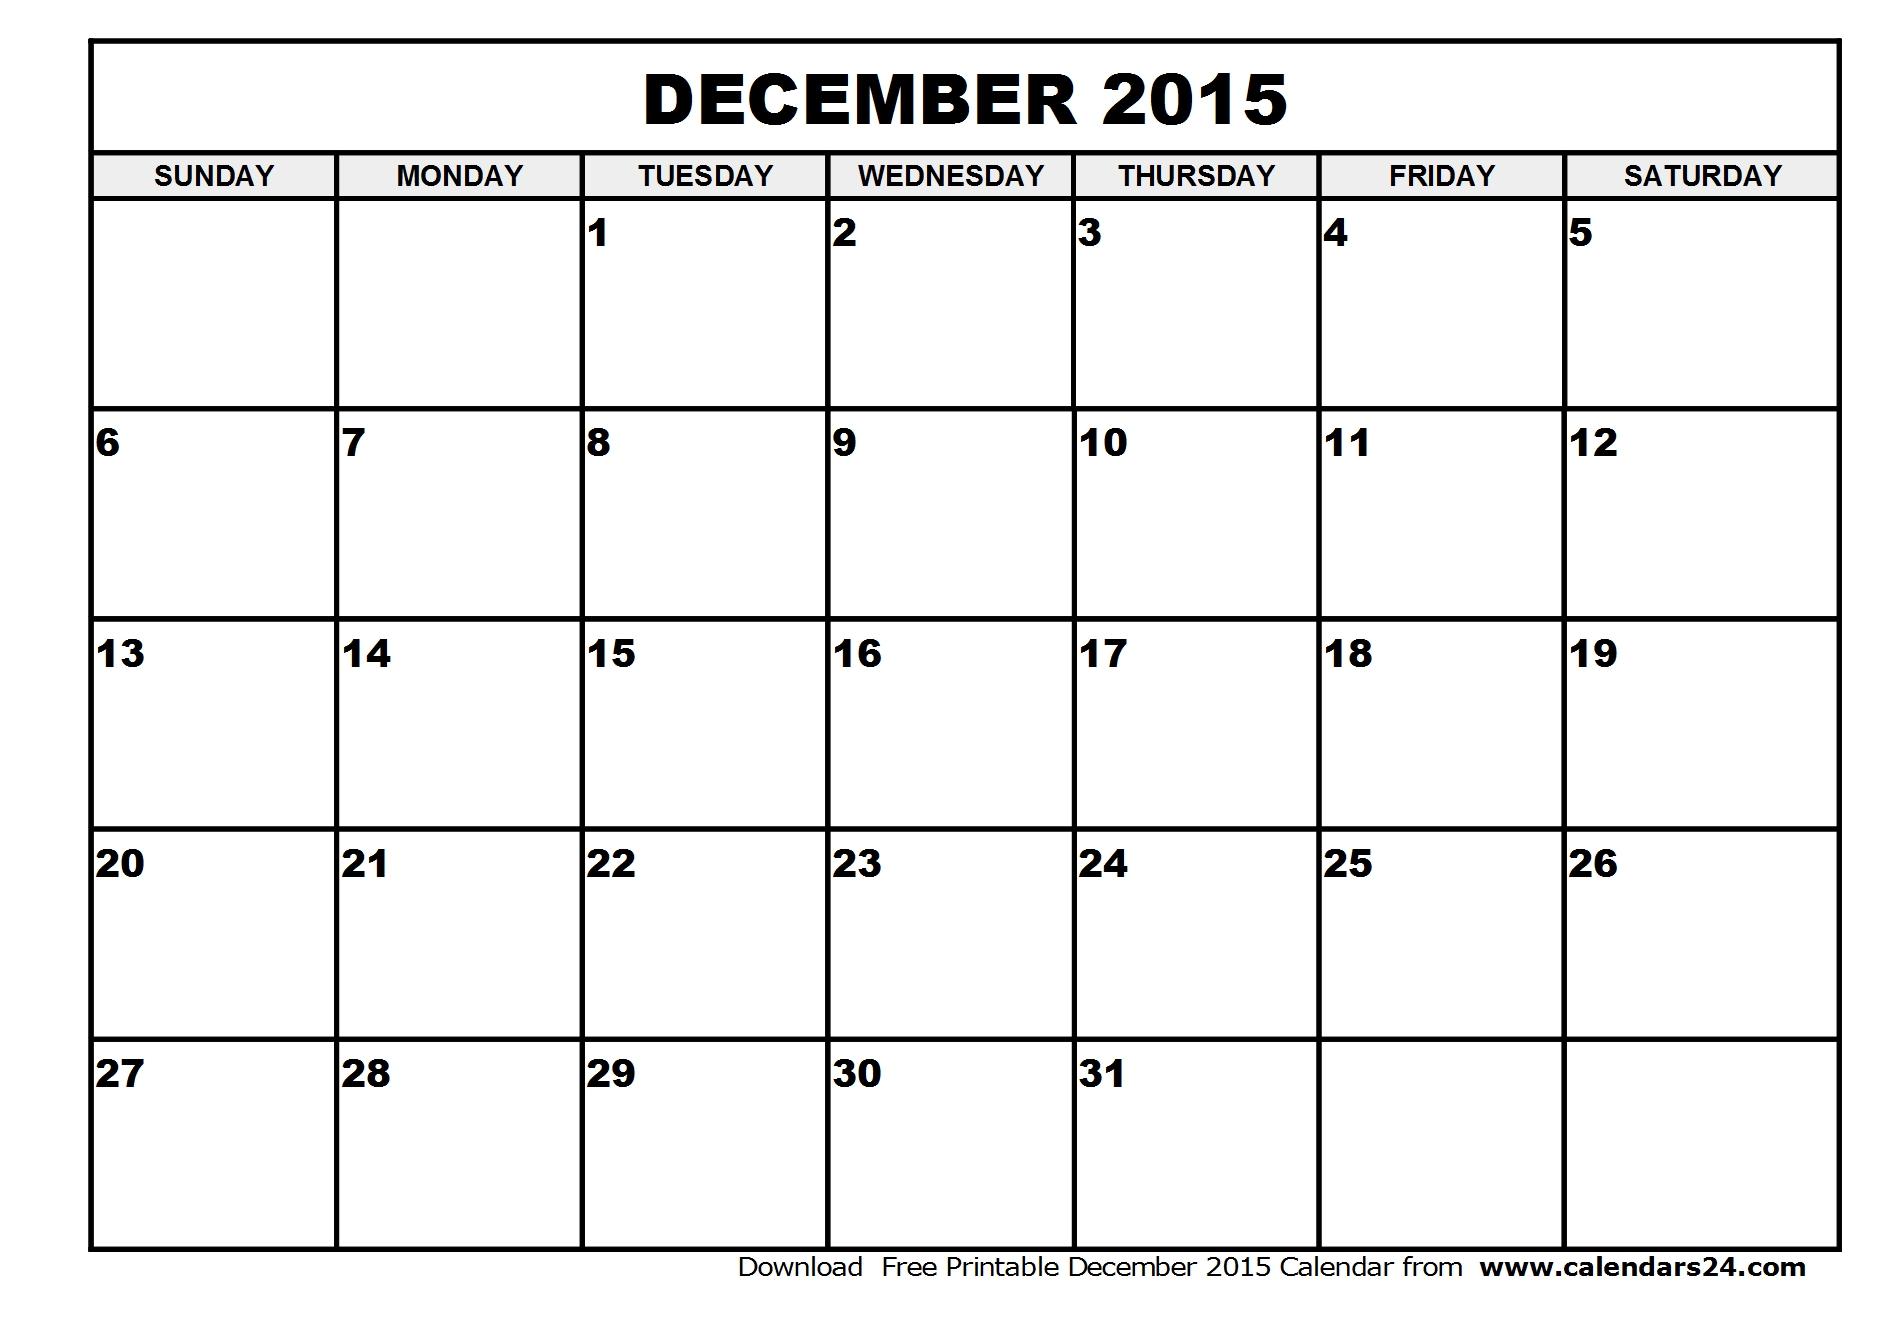 December_2015_Calendar_with_Holidays.jpg.